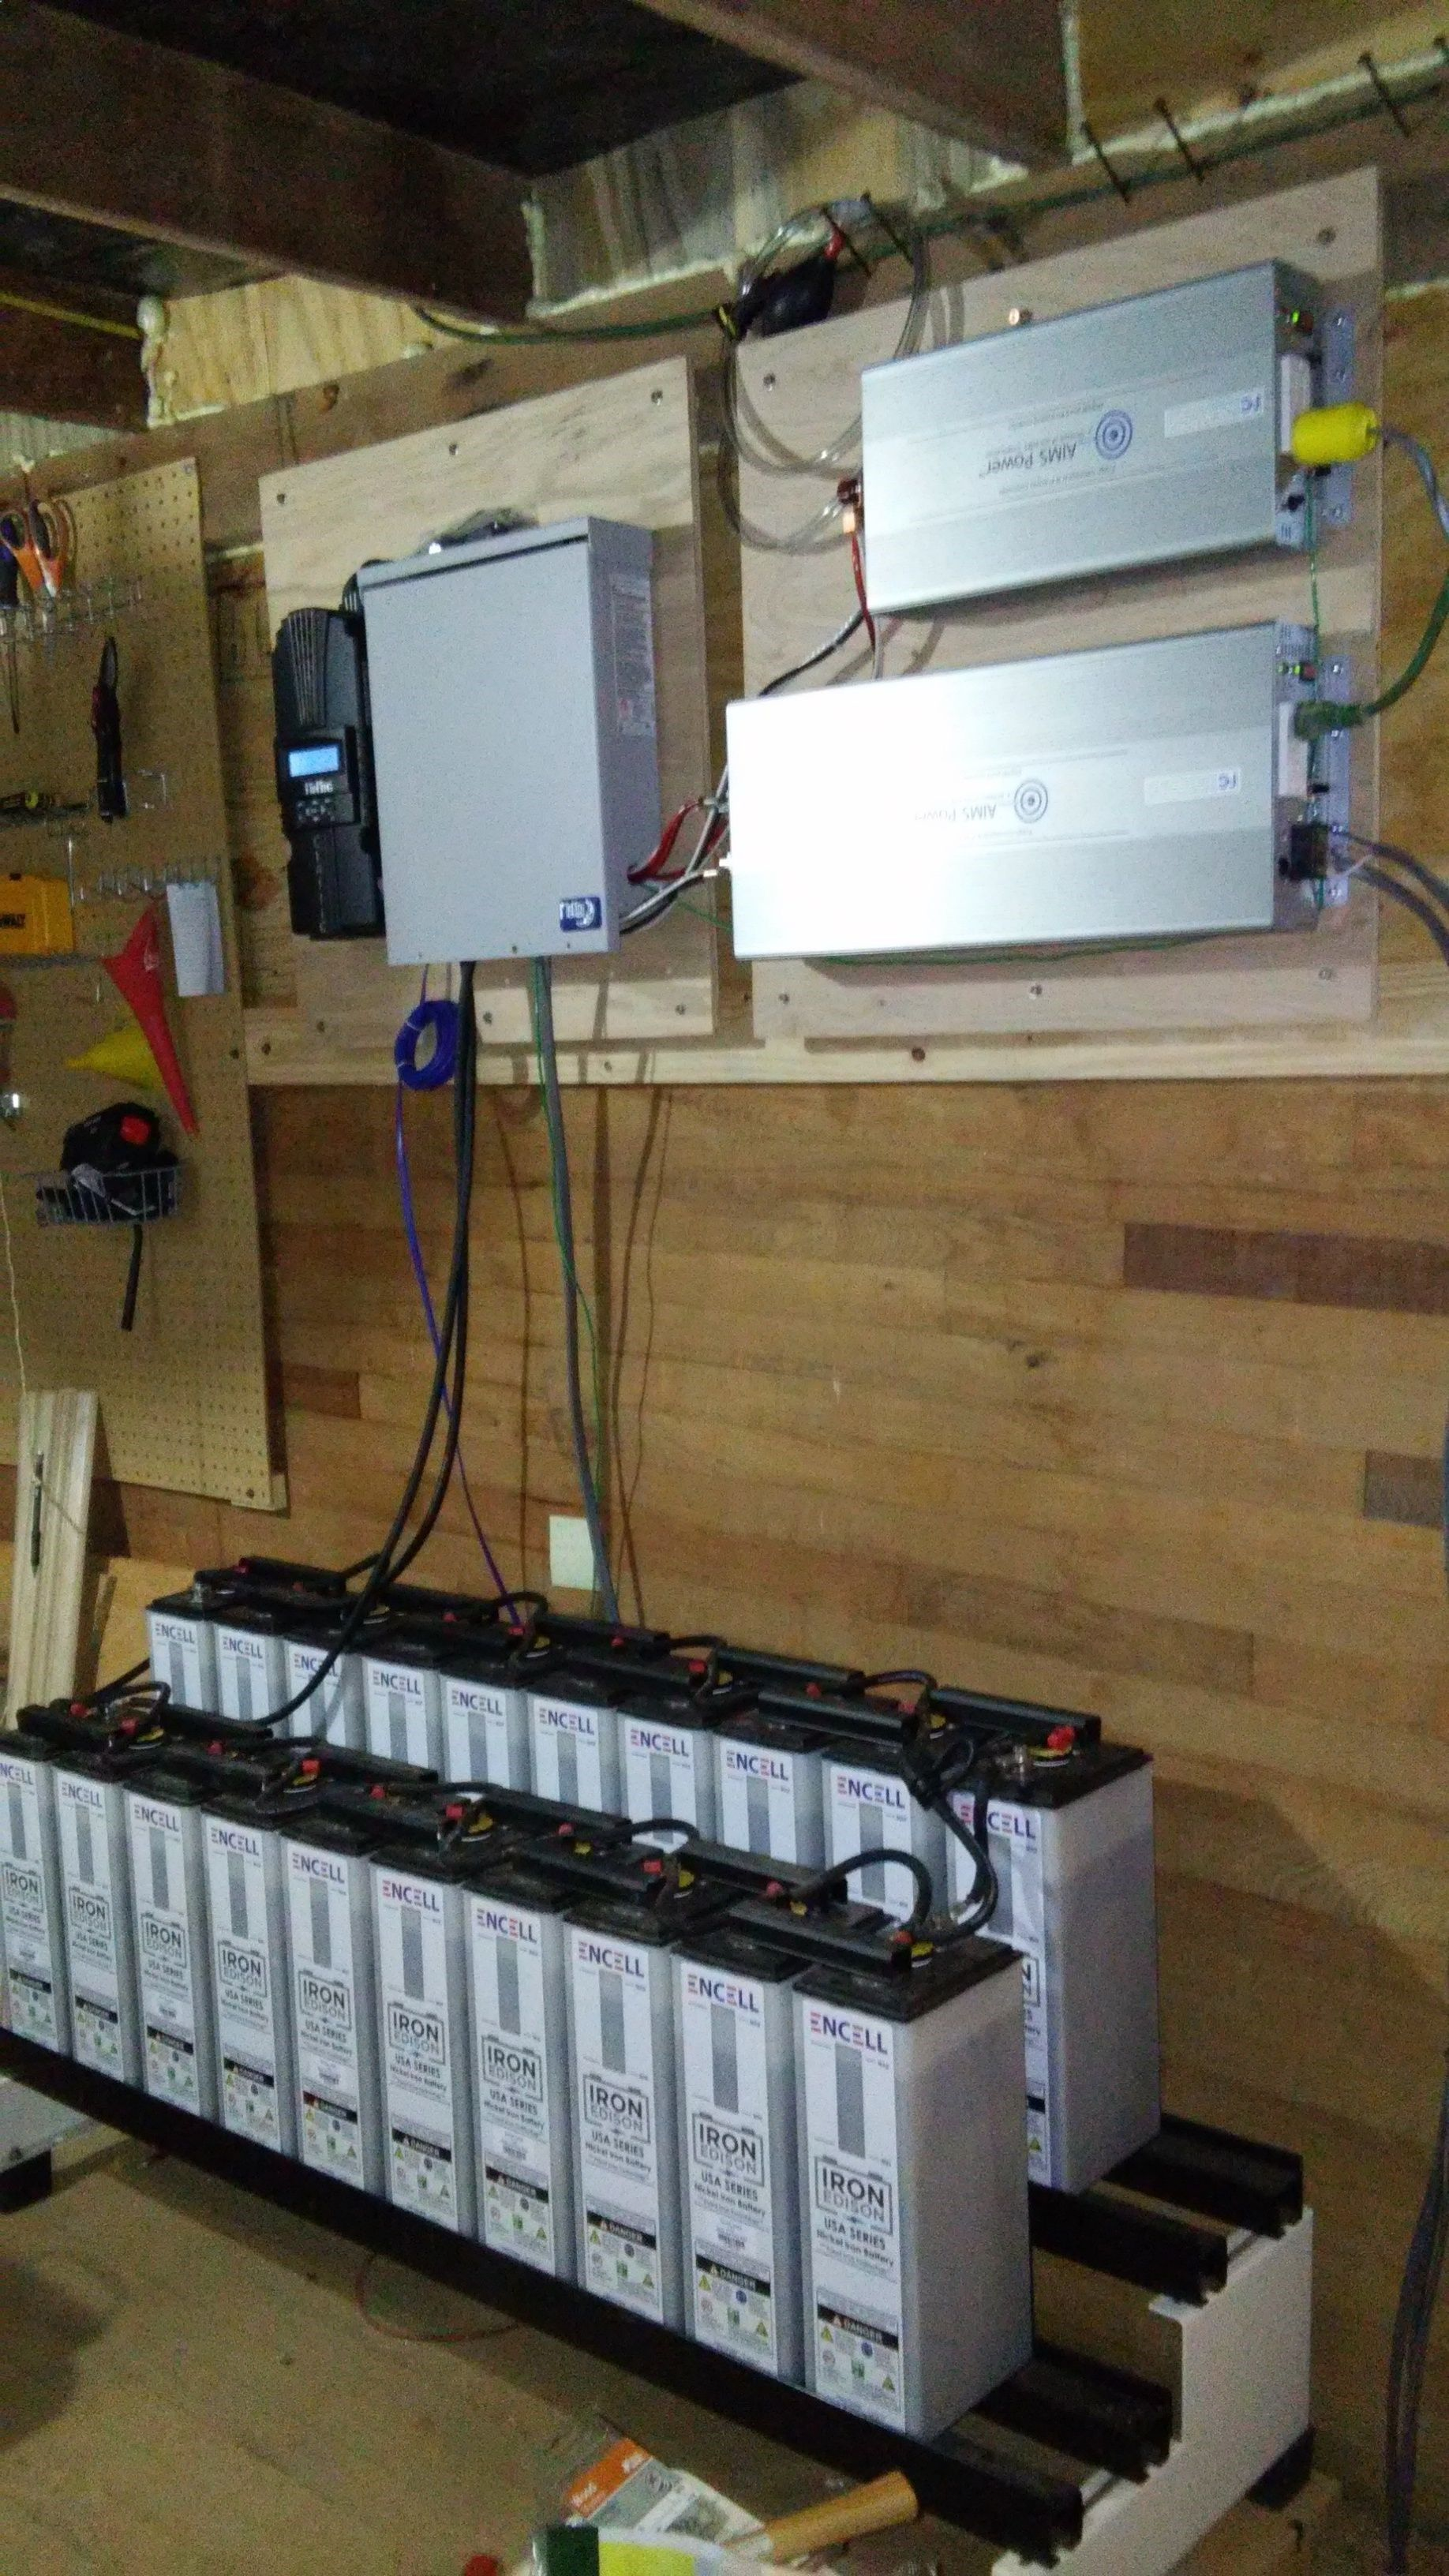 300ah 24v Iron Edison Nickel Iron Battery Built In The Usa By Encell Technology Http Homeenergysite Com Electri Solar Power Solar Panels Solar Power System